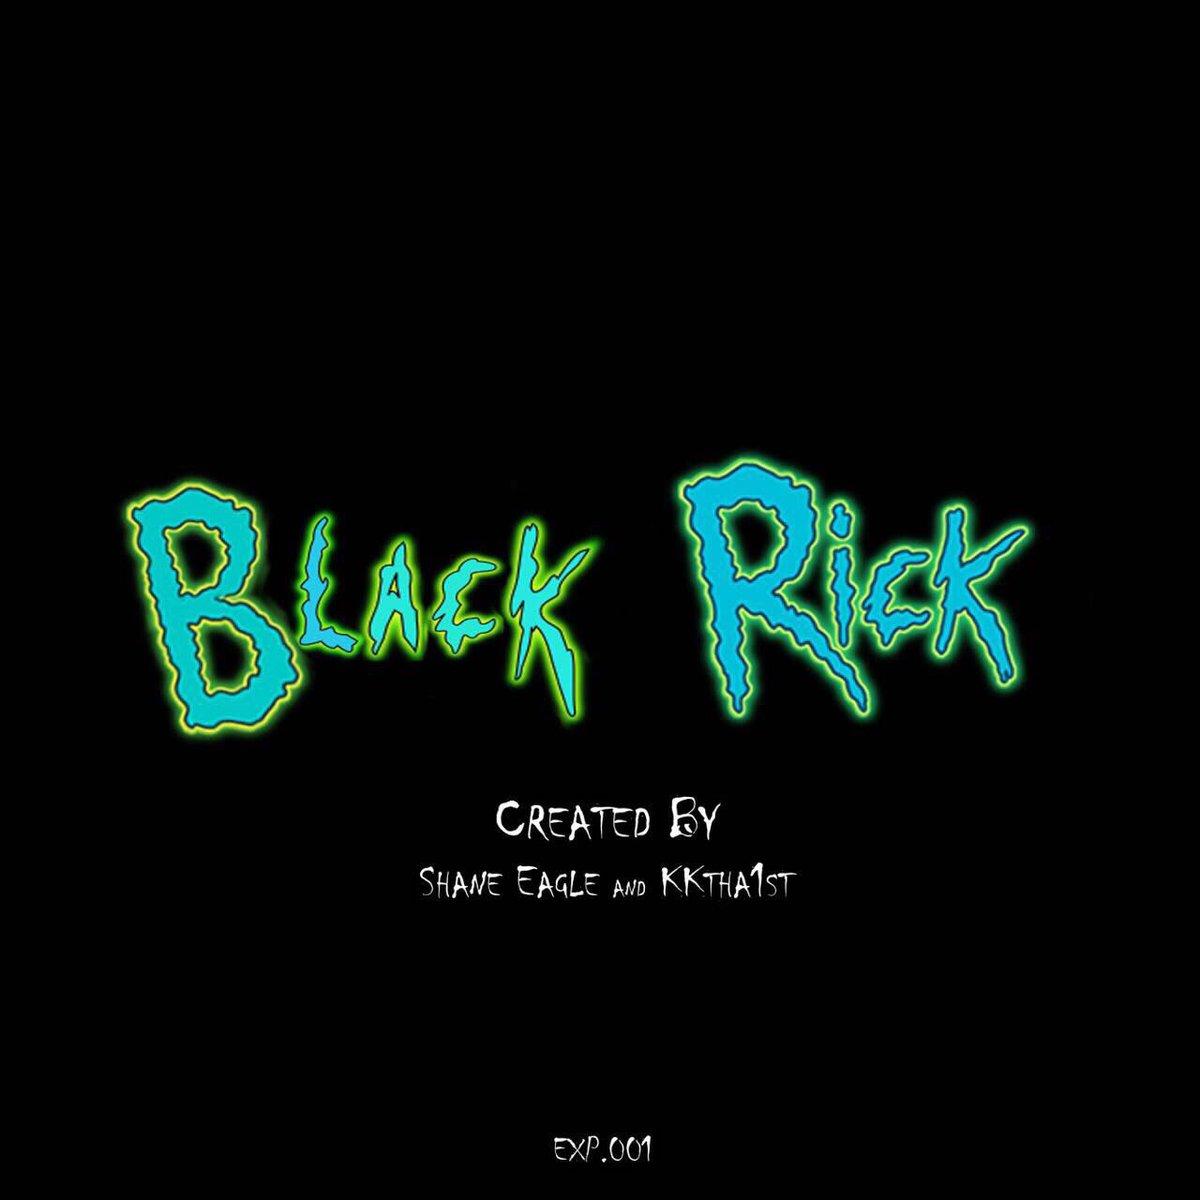 New Release: Shane Eagle - Black Rick